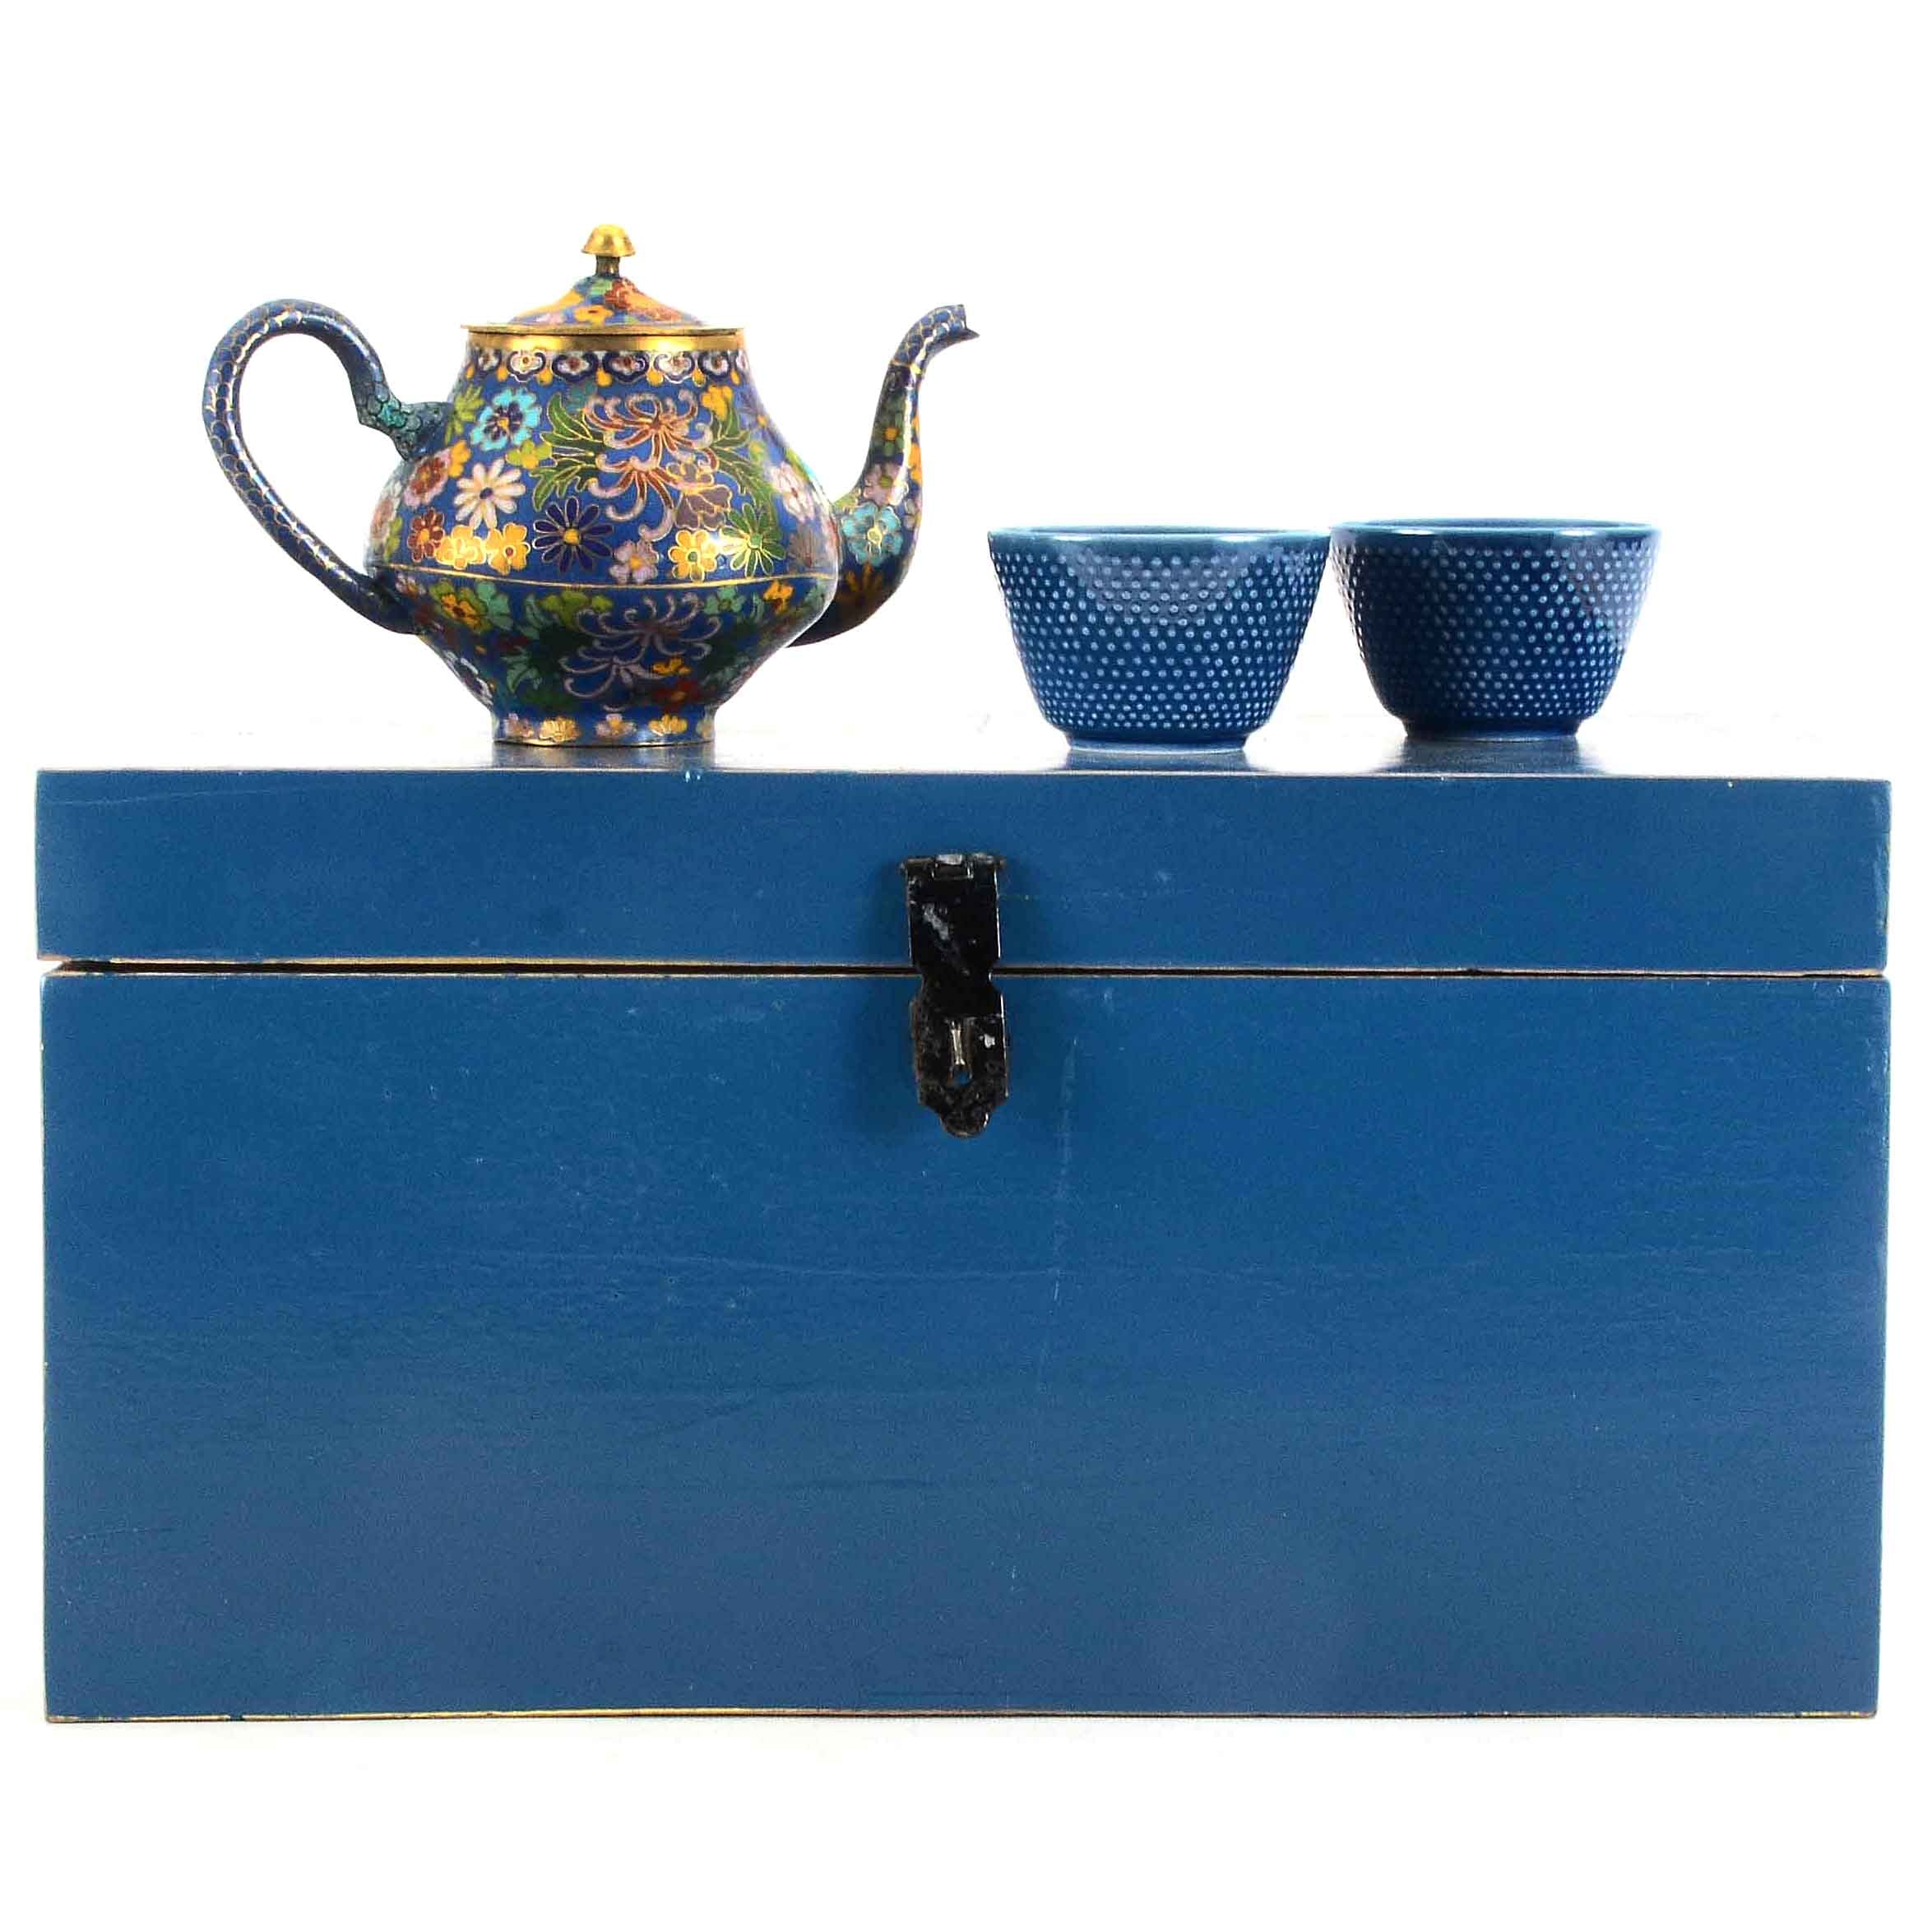 Cloisonne Teapot and Teacups